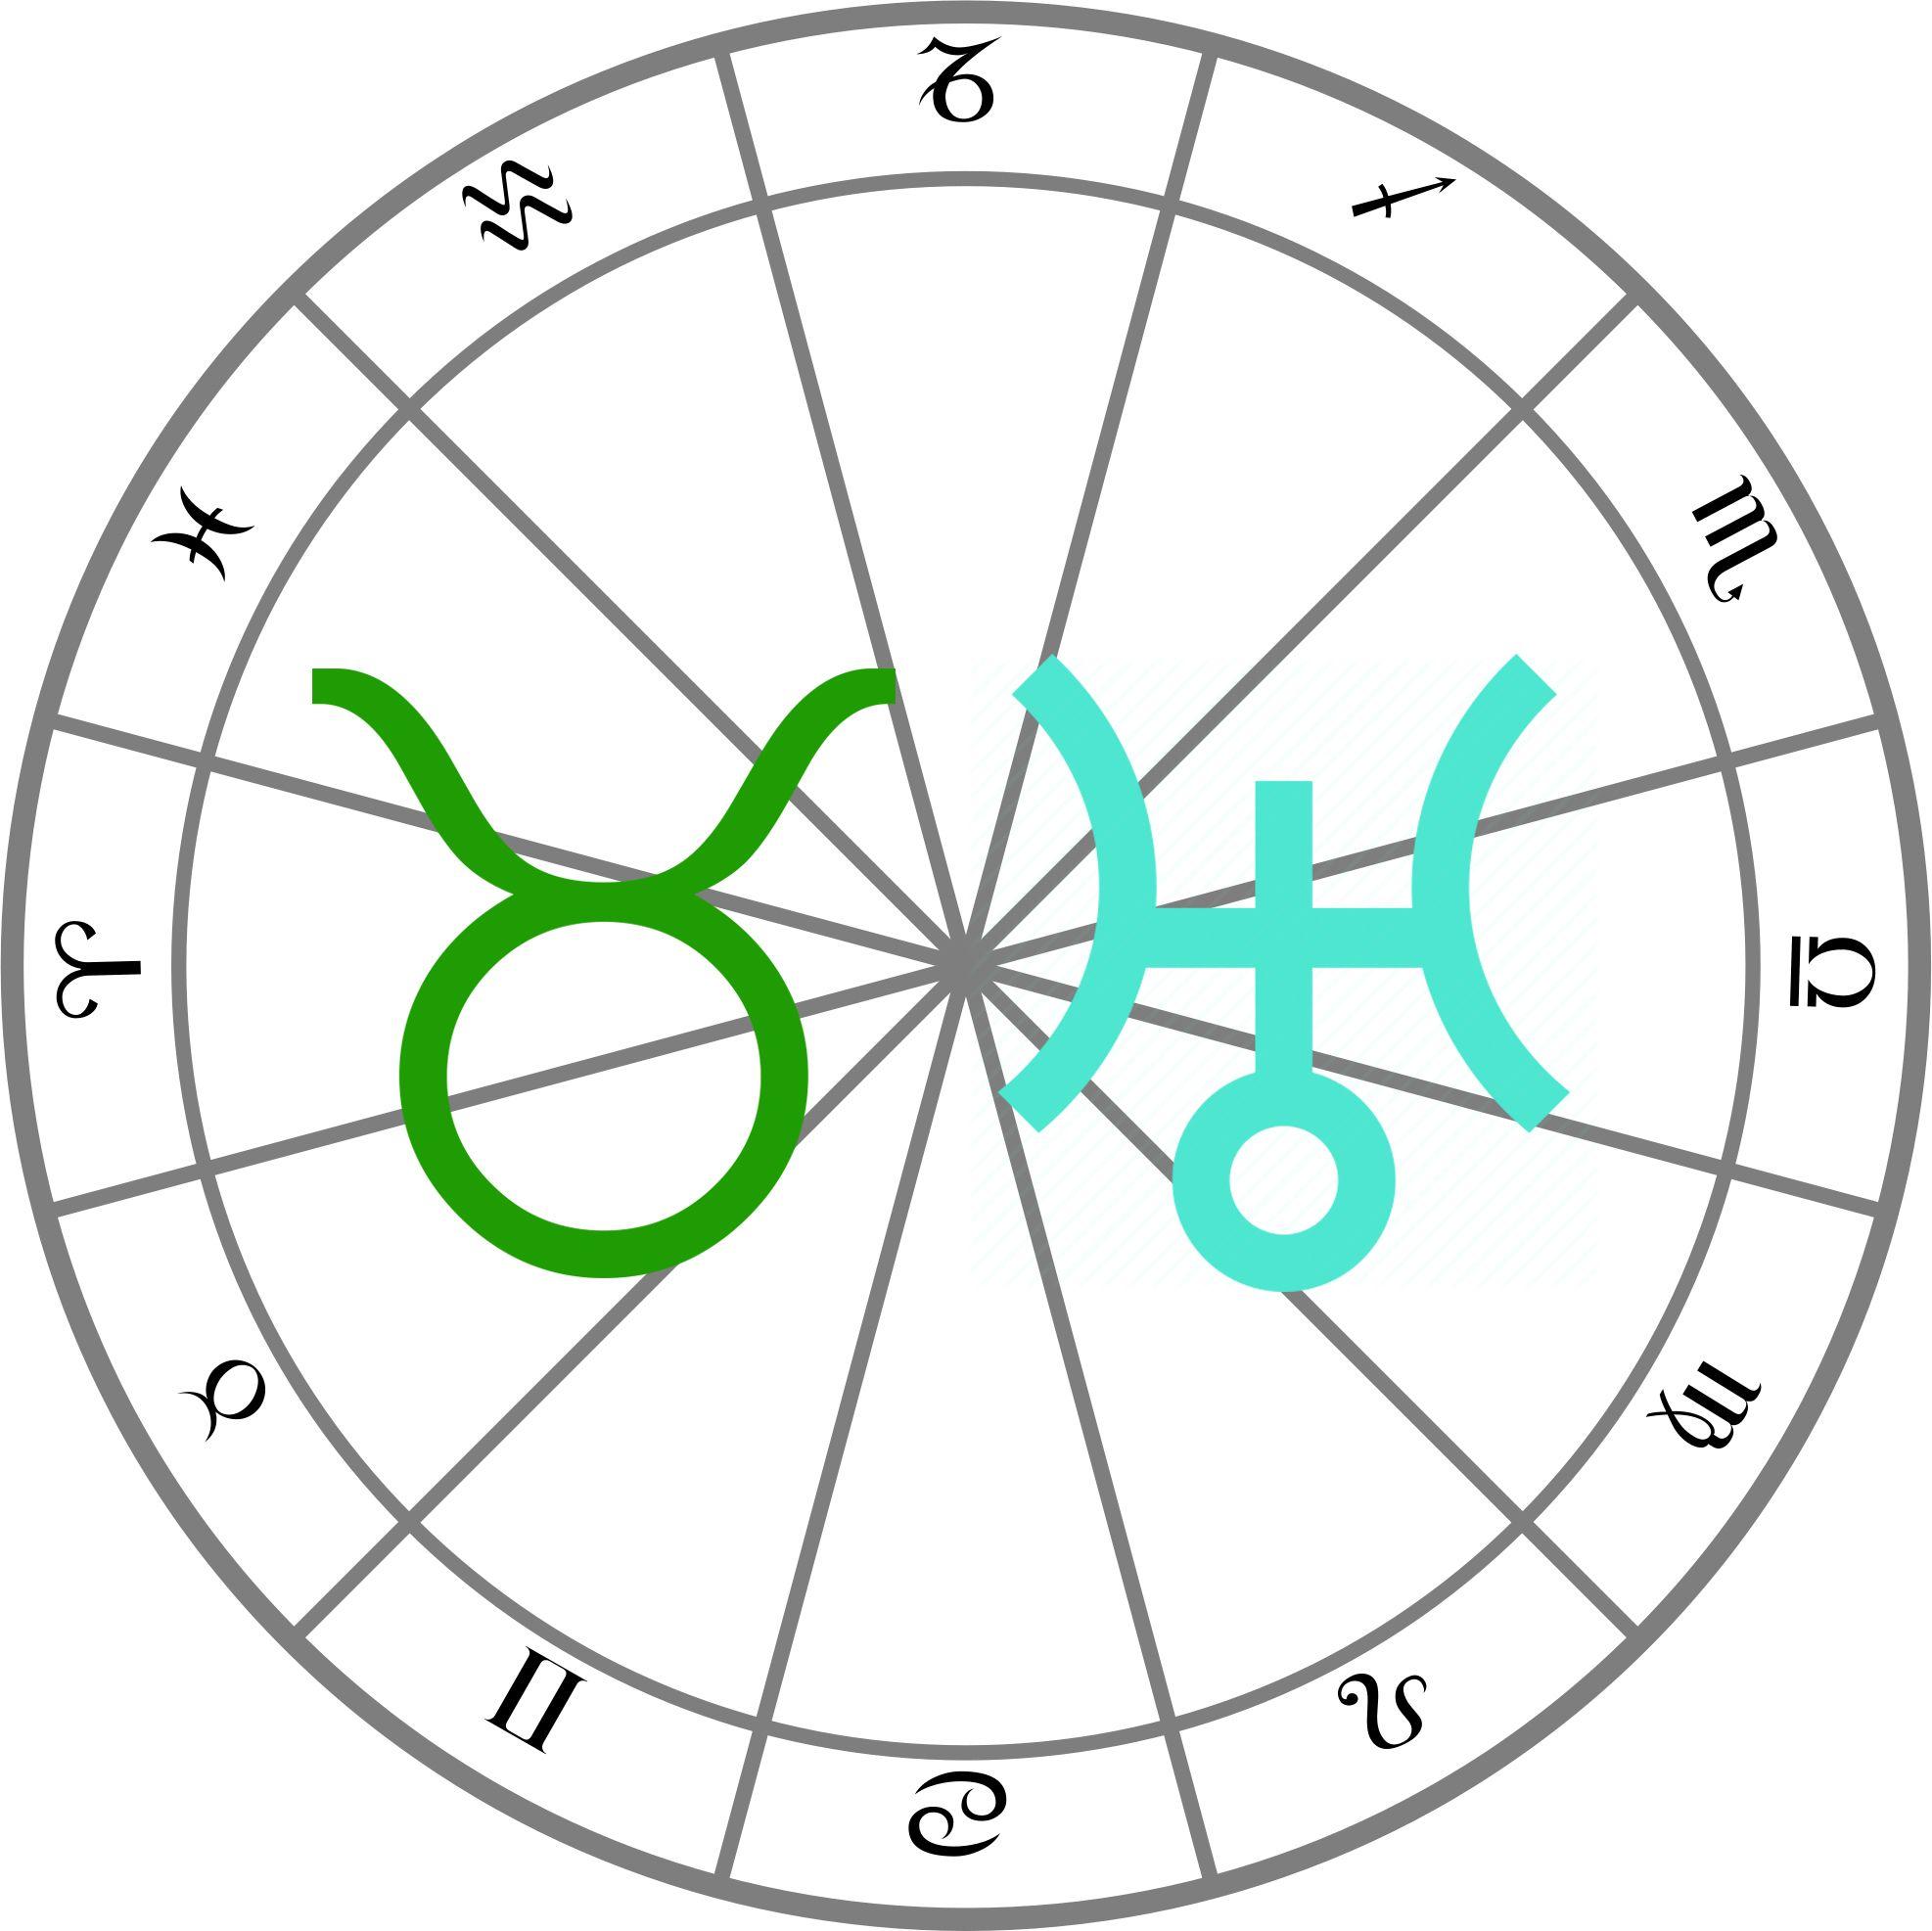 Ta E Uran U Biku Doneti Zodijakim Znacimawhat Uranus In Taurus